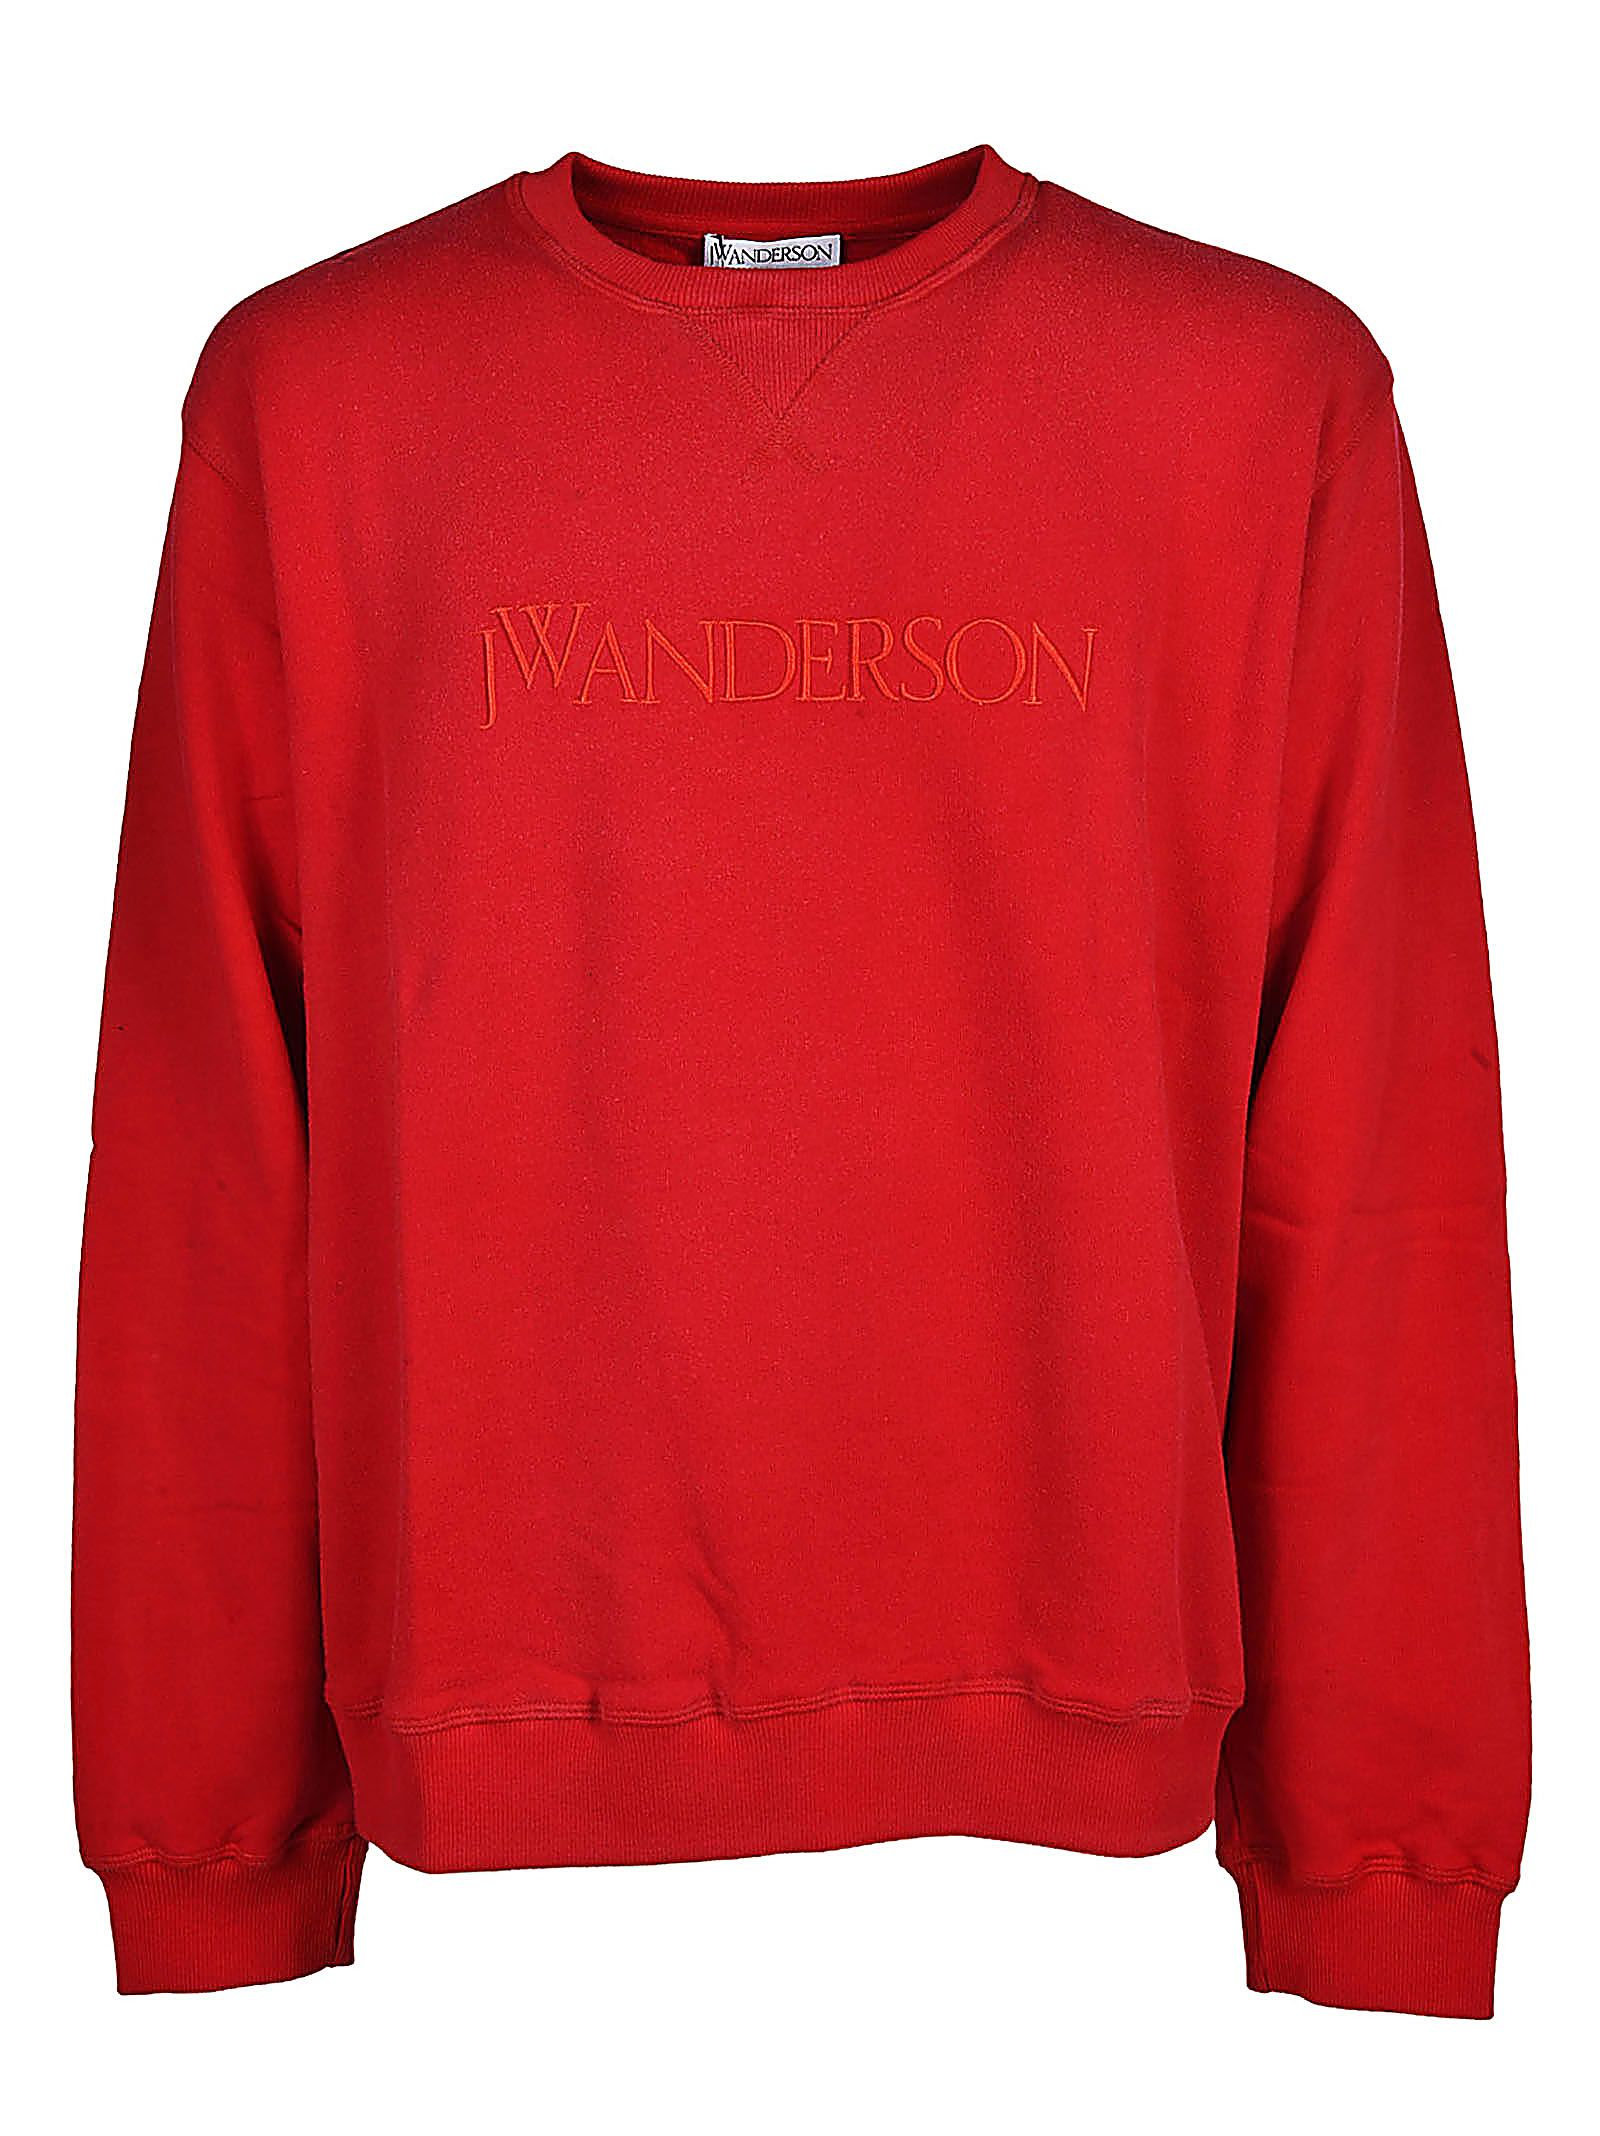 J.w Anderson Logo Print Sweatshirt